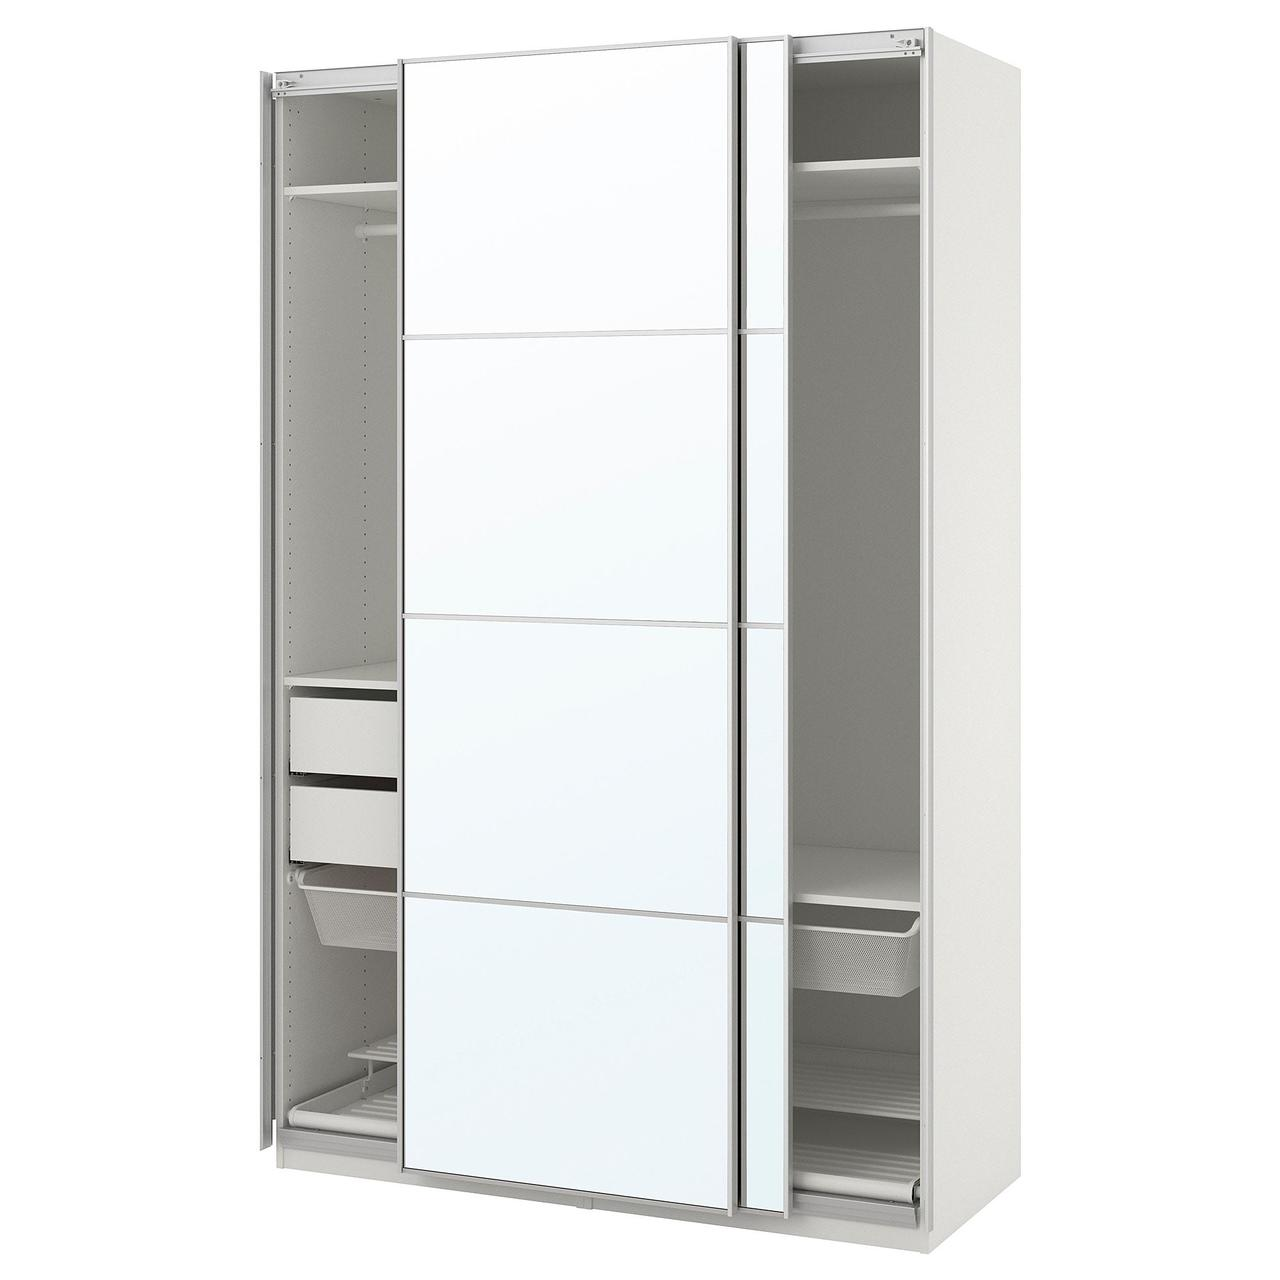 Гардероб IKEA PAX белый Аули зеркальное стекло 150x66x236 см 493.058.77